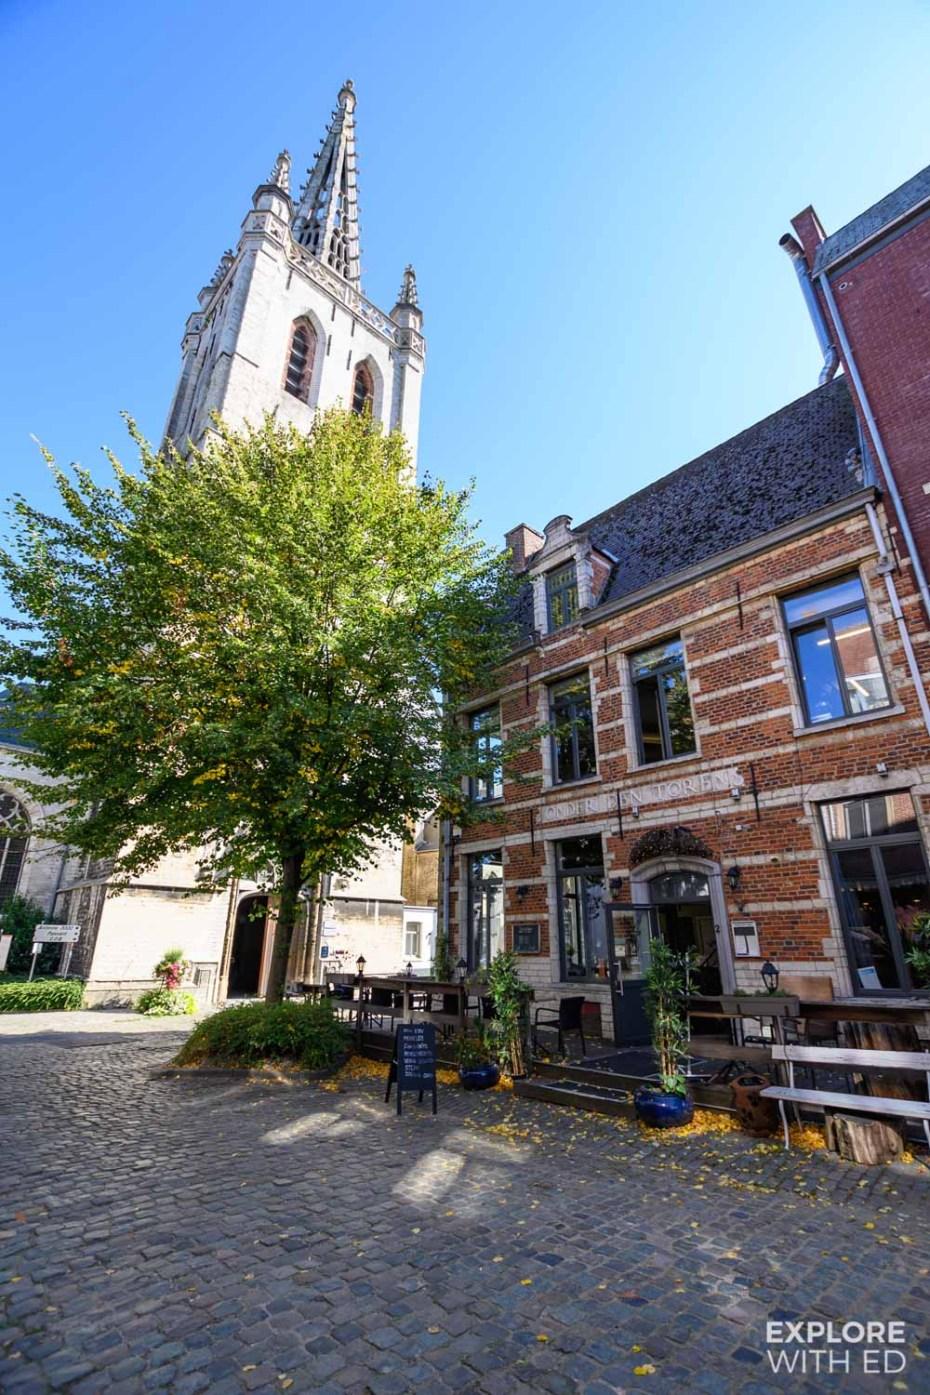 St Gertrude's Abbey in Leuven, Belgium